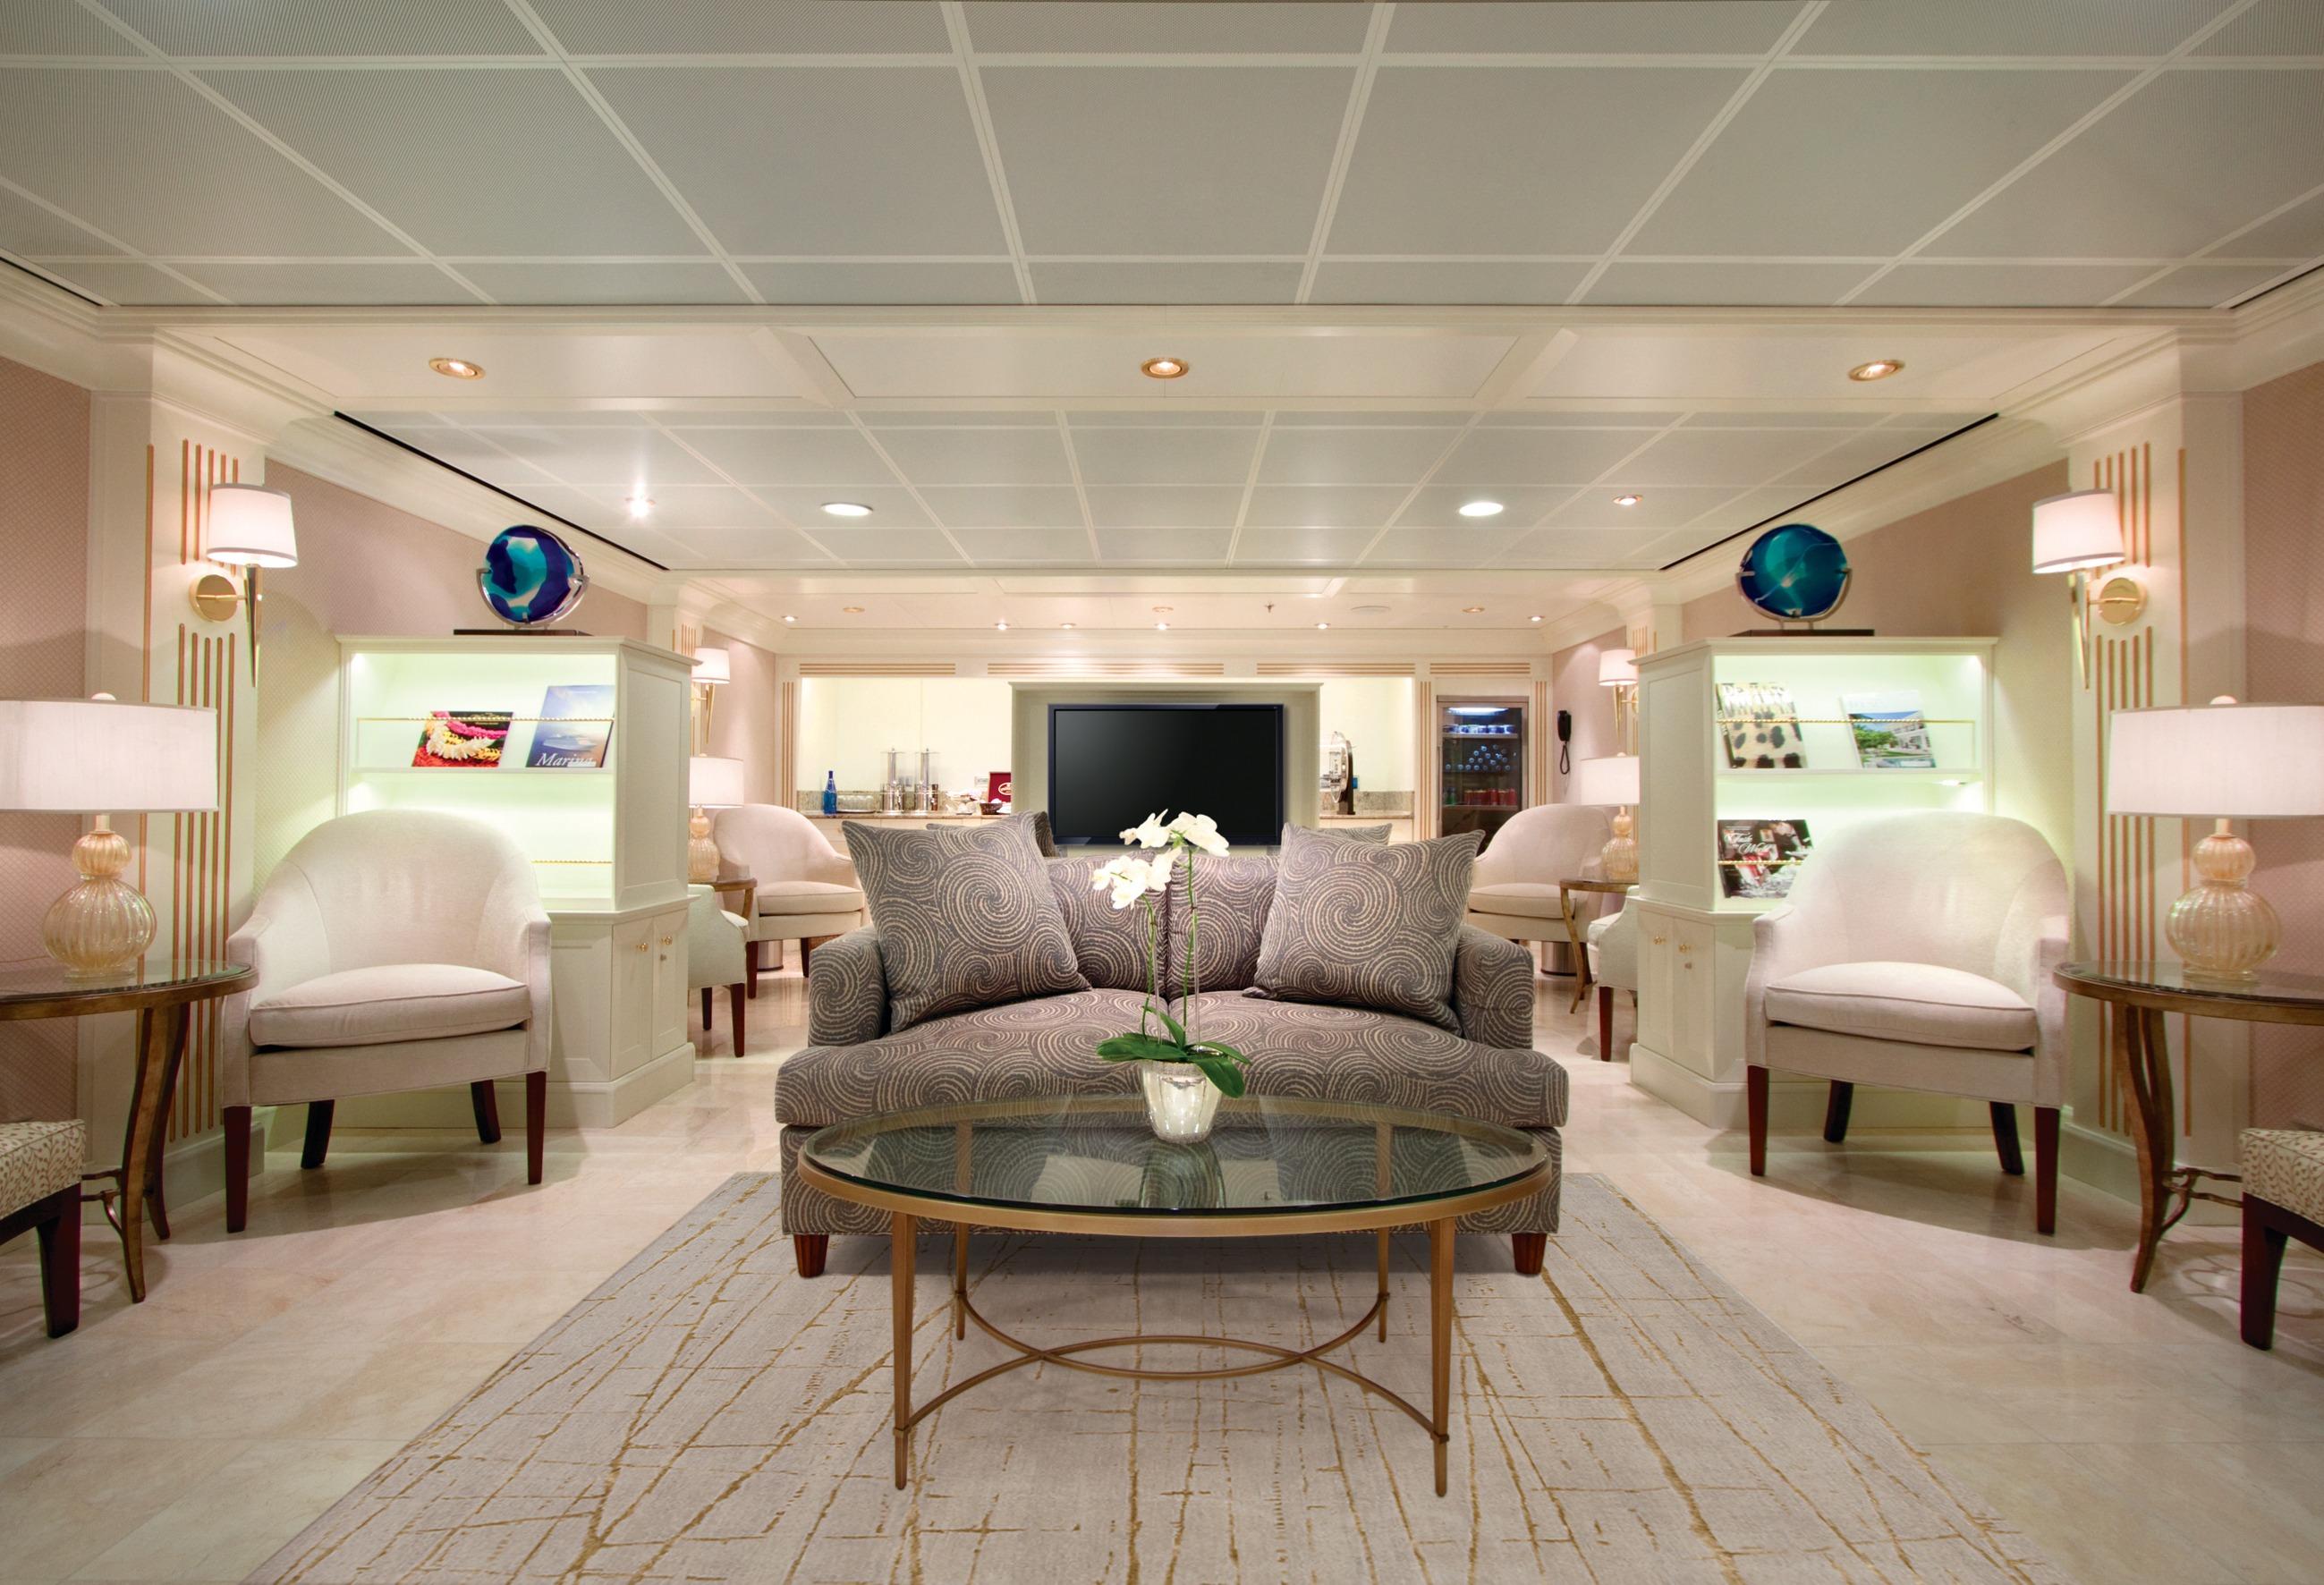 Penthouse Floor Plan Ms Oceania Riviera Oceania Cruises